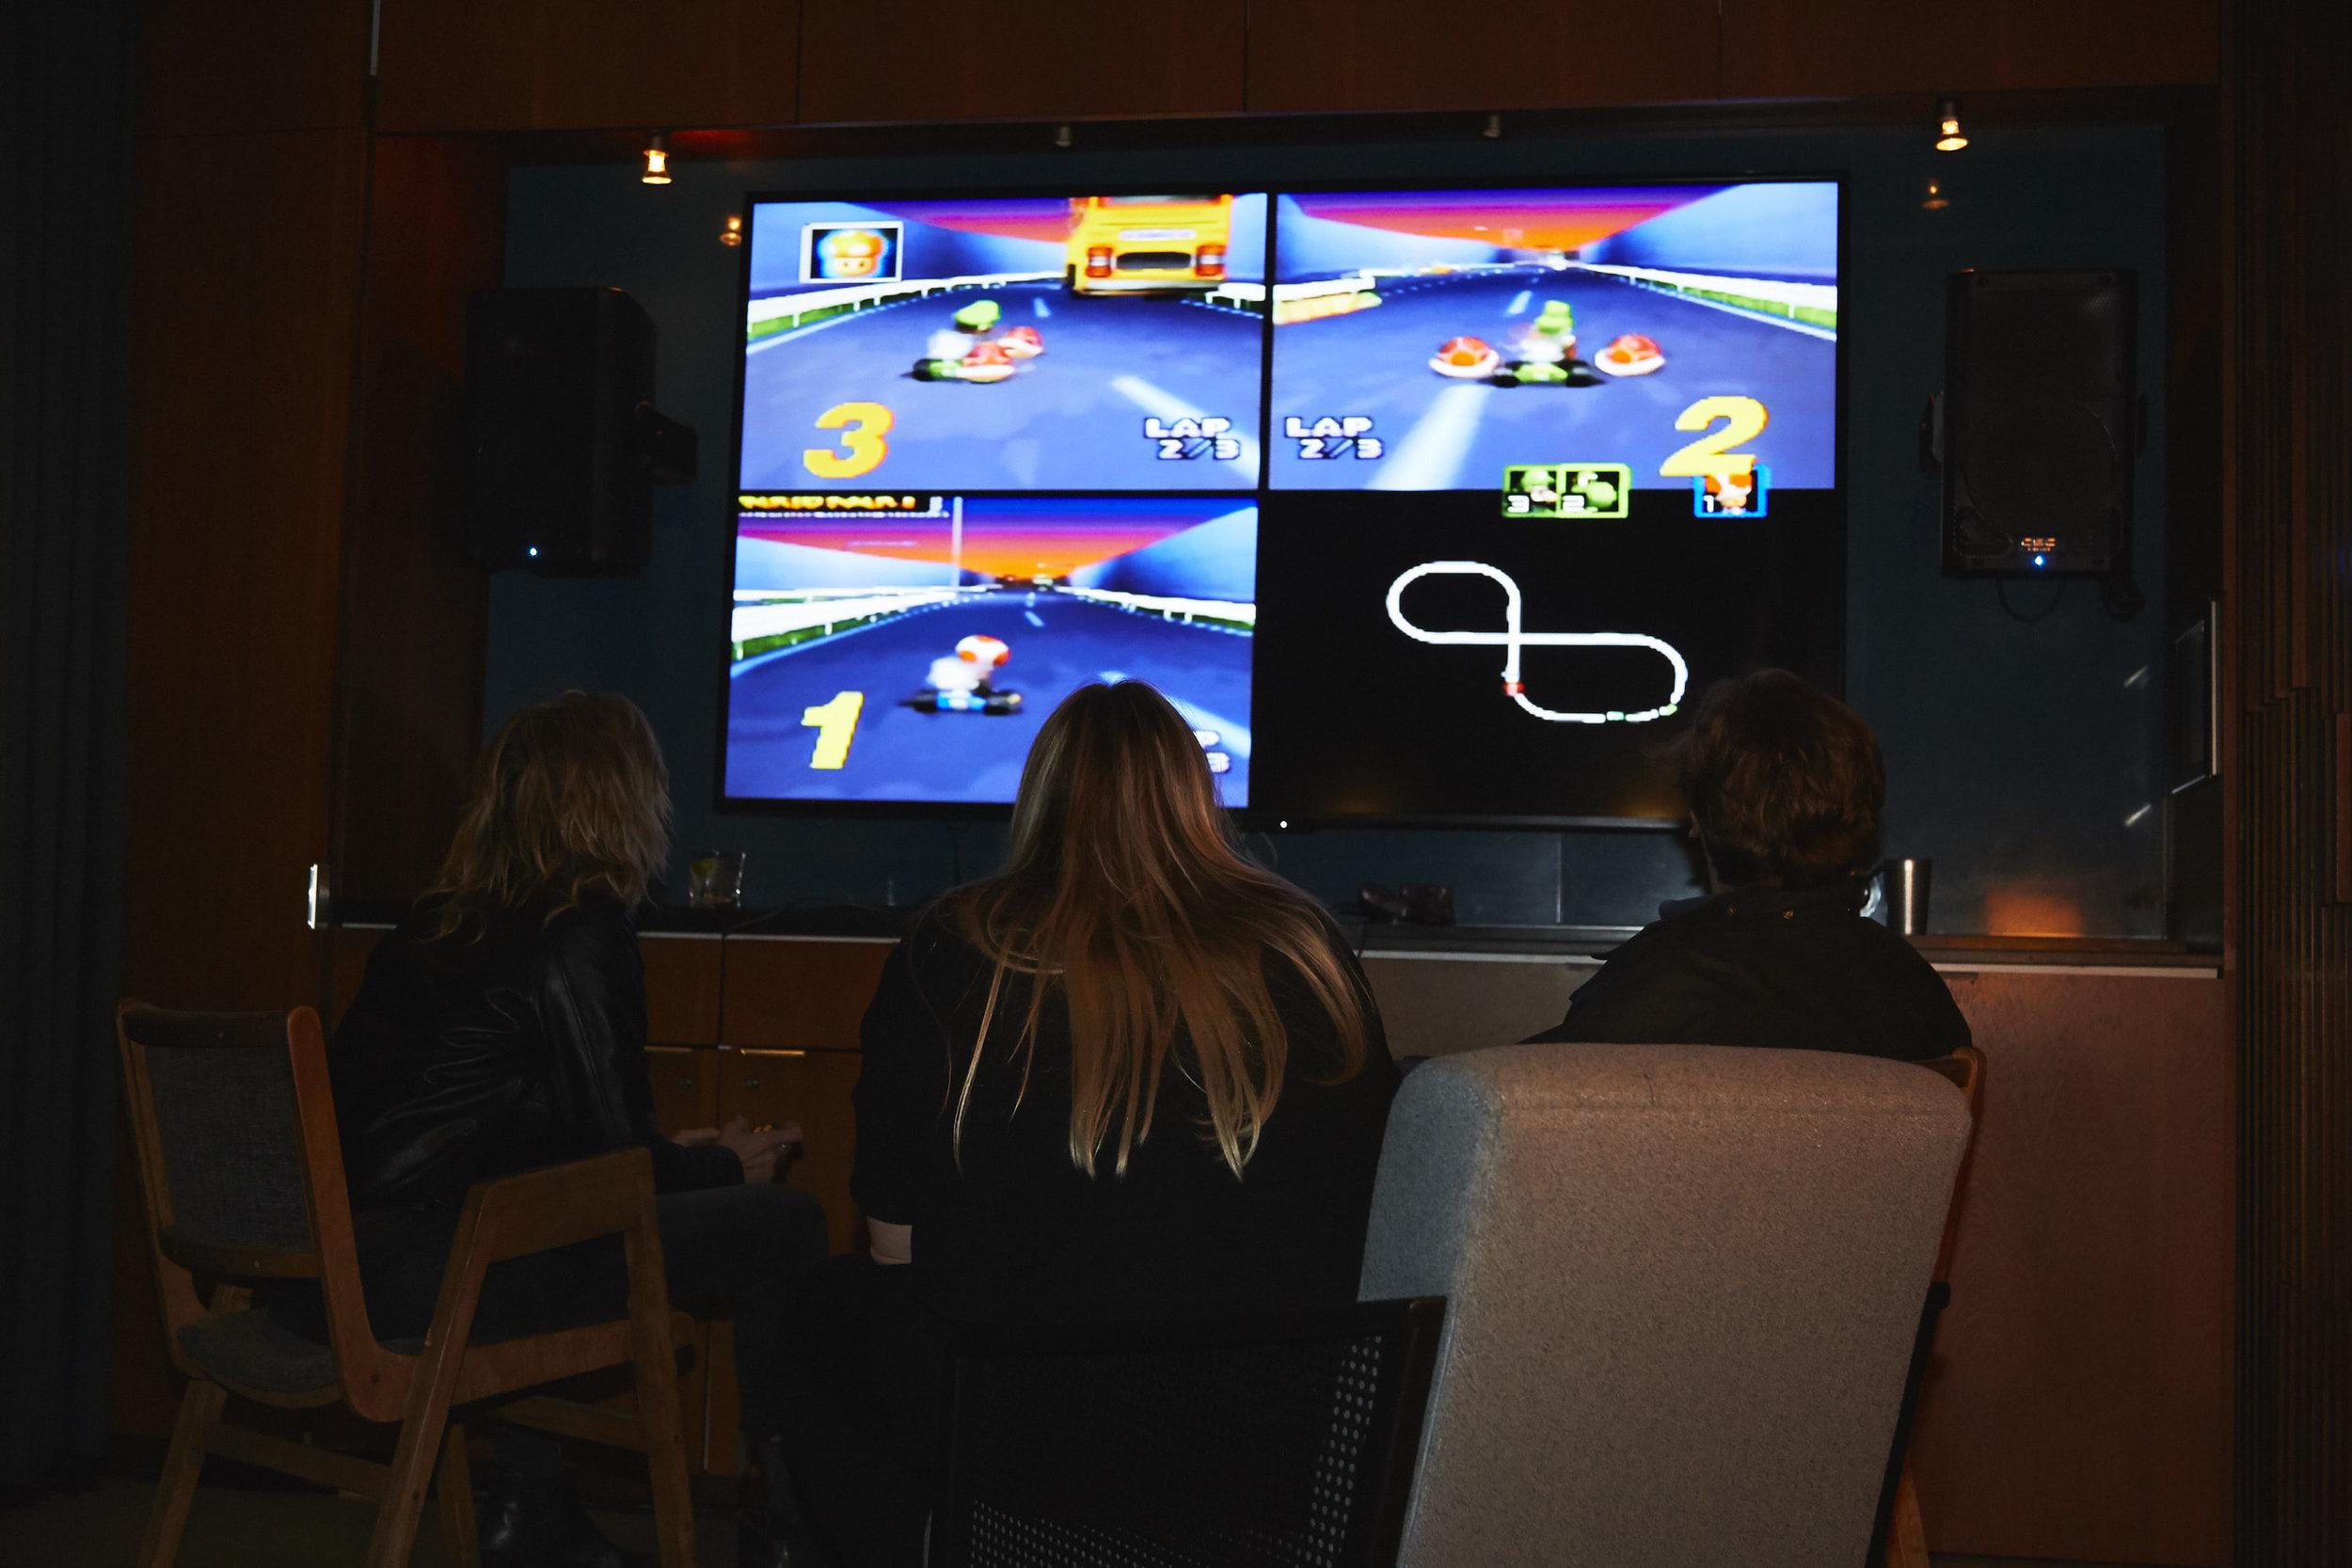 Nintendo 64 game room